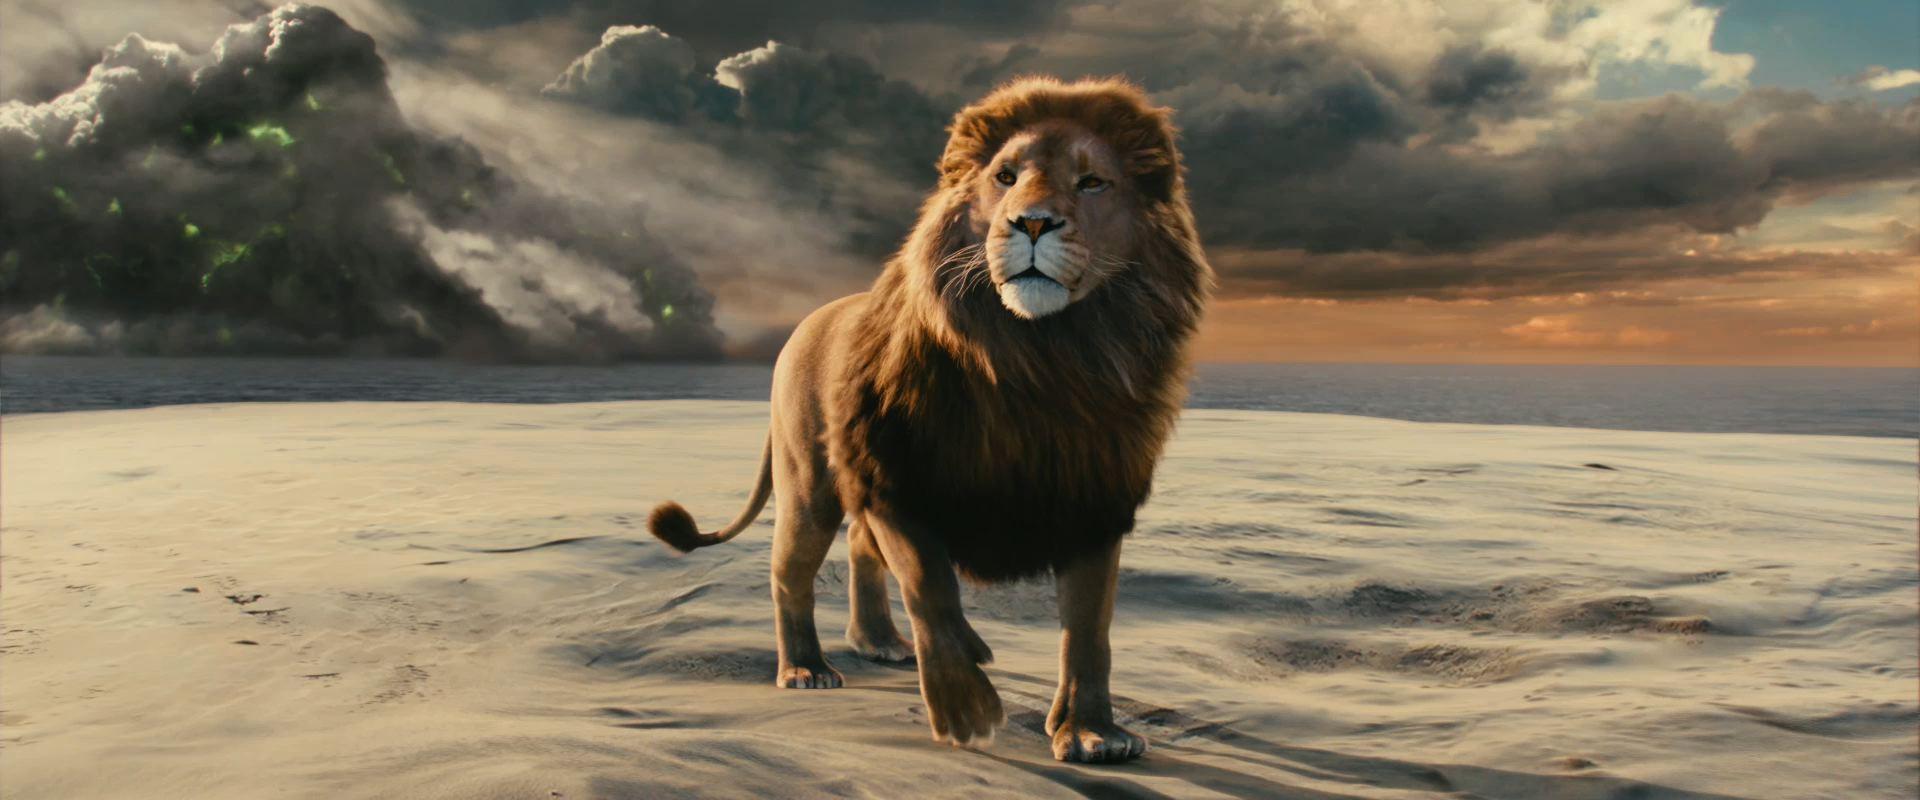 лев аслан из нарнии картинки меня